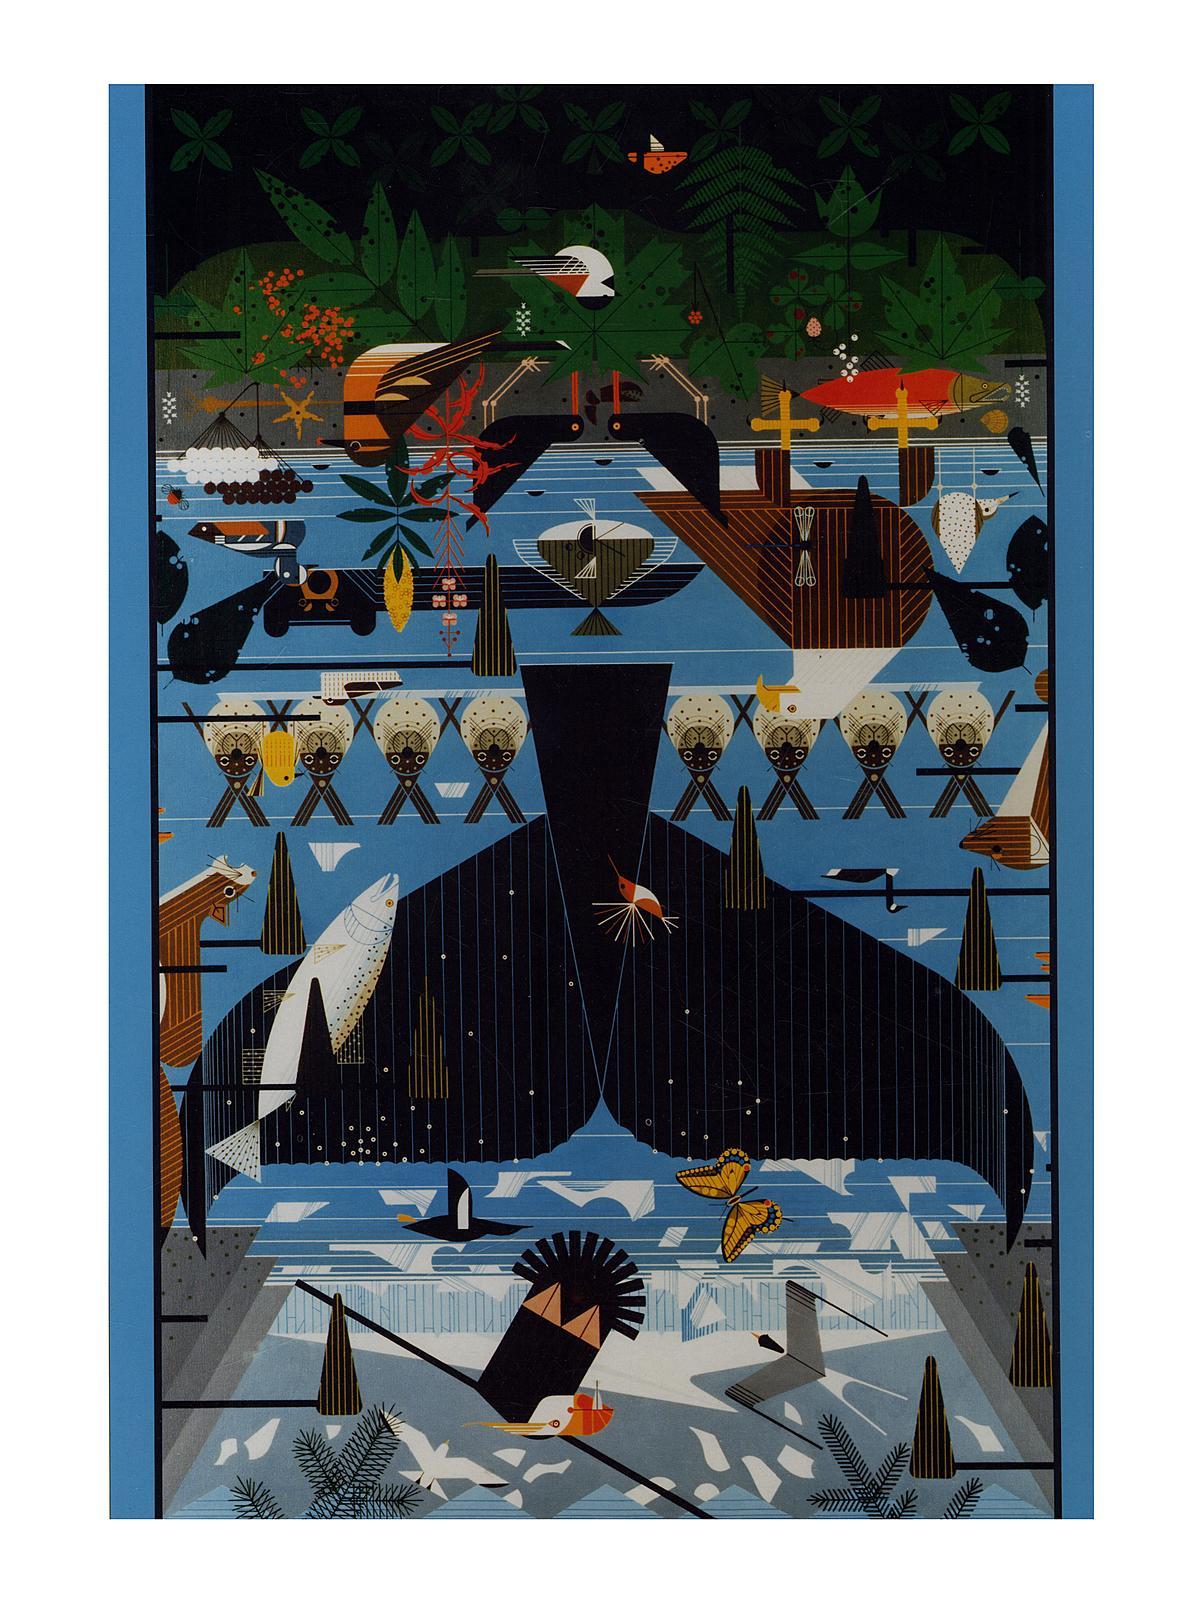 1000-piece Jigsaw Puzzles Charley Harper: Glacier Bay, Alaska